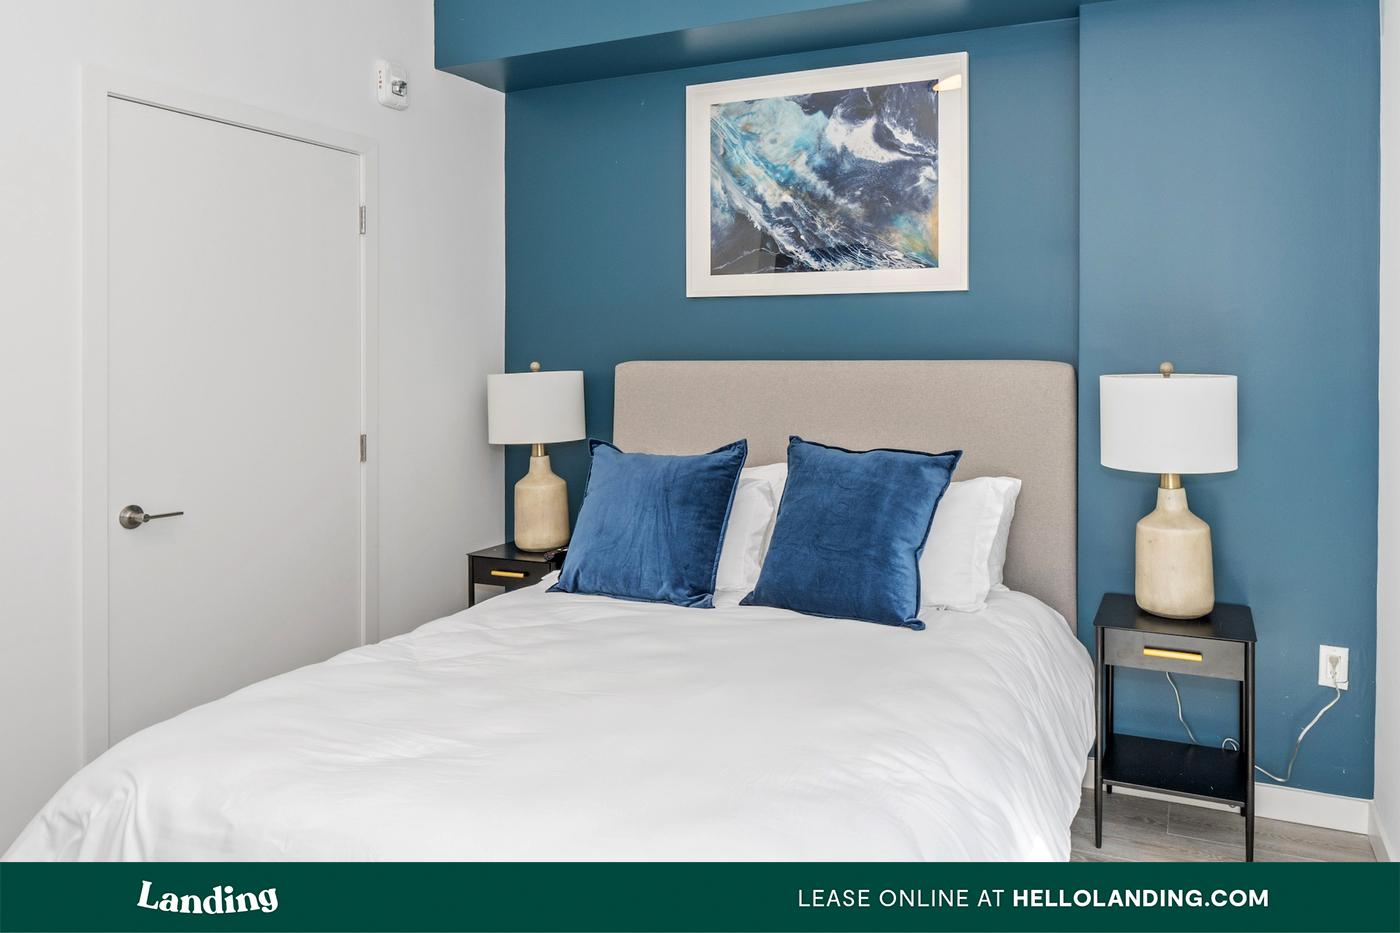 Landing Furnished Apartment Bellancia for rent